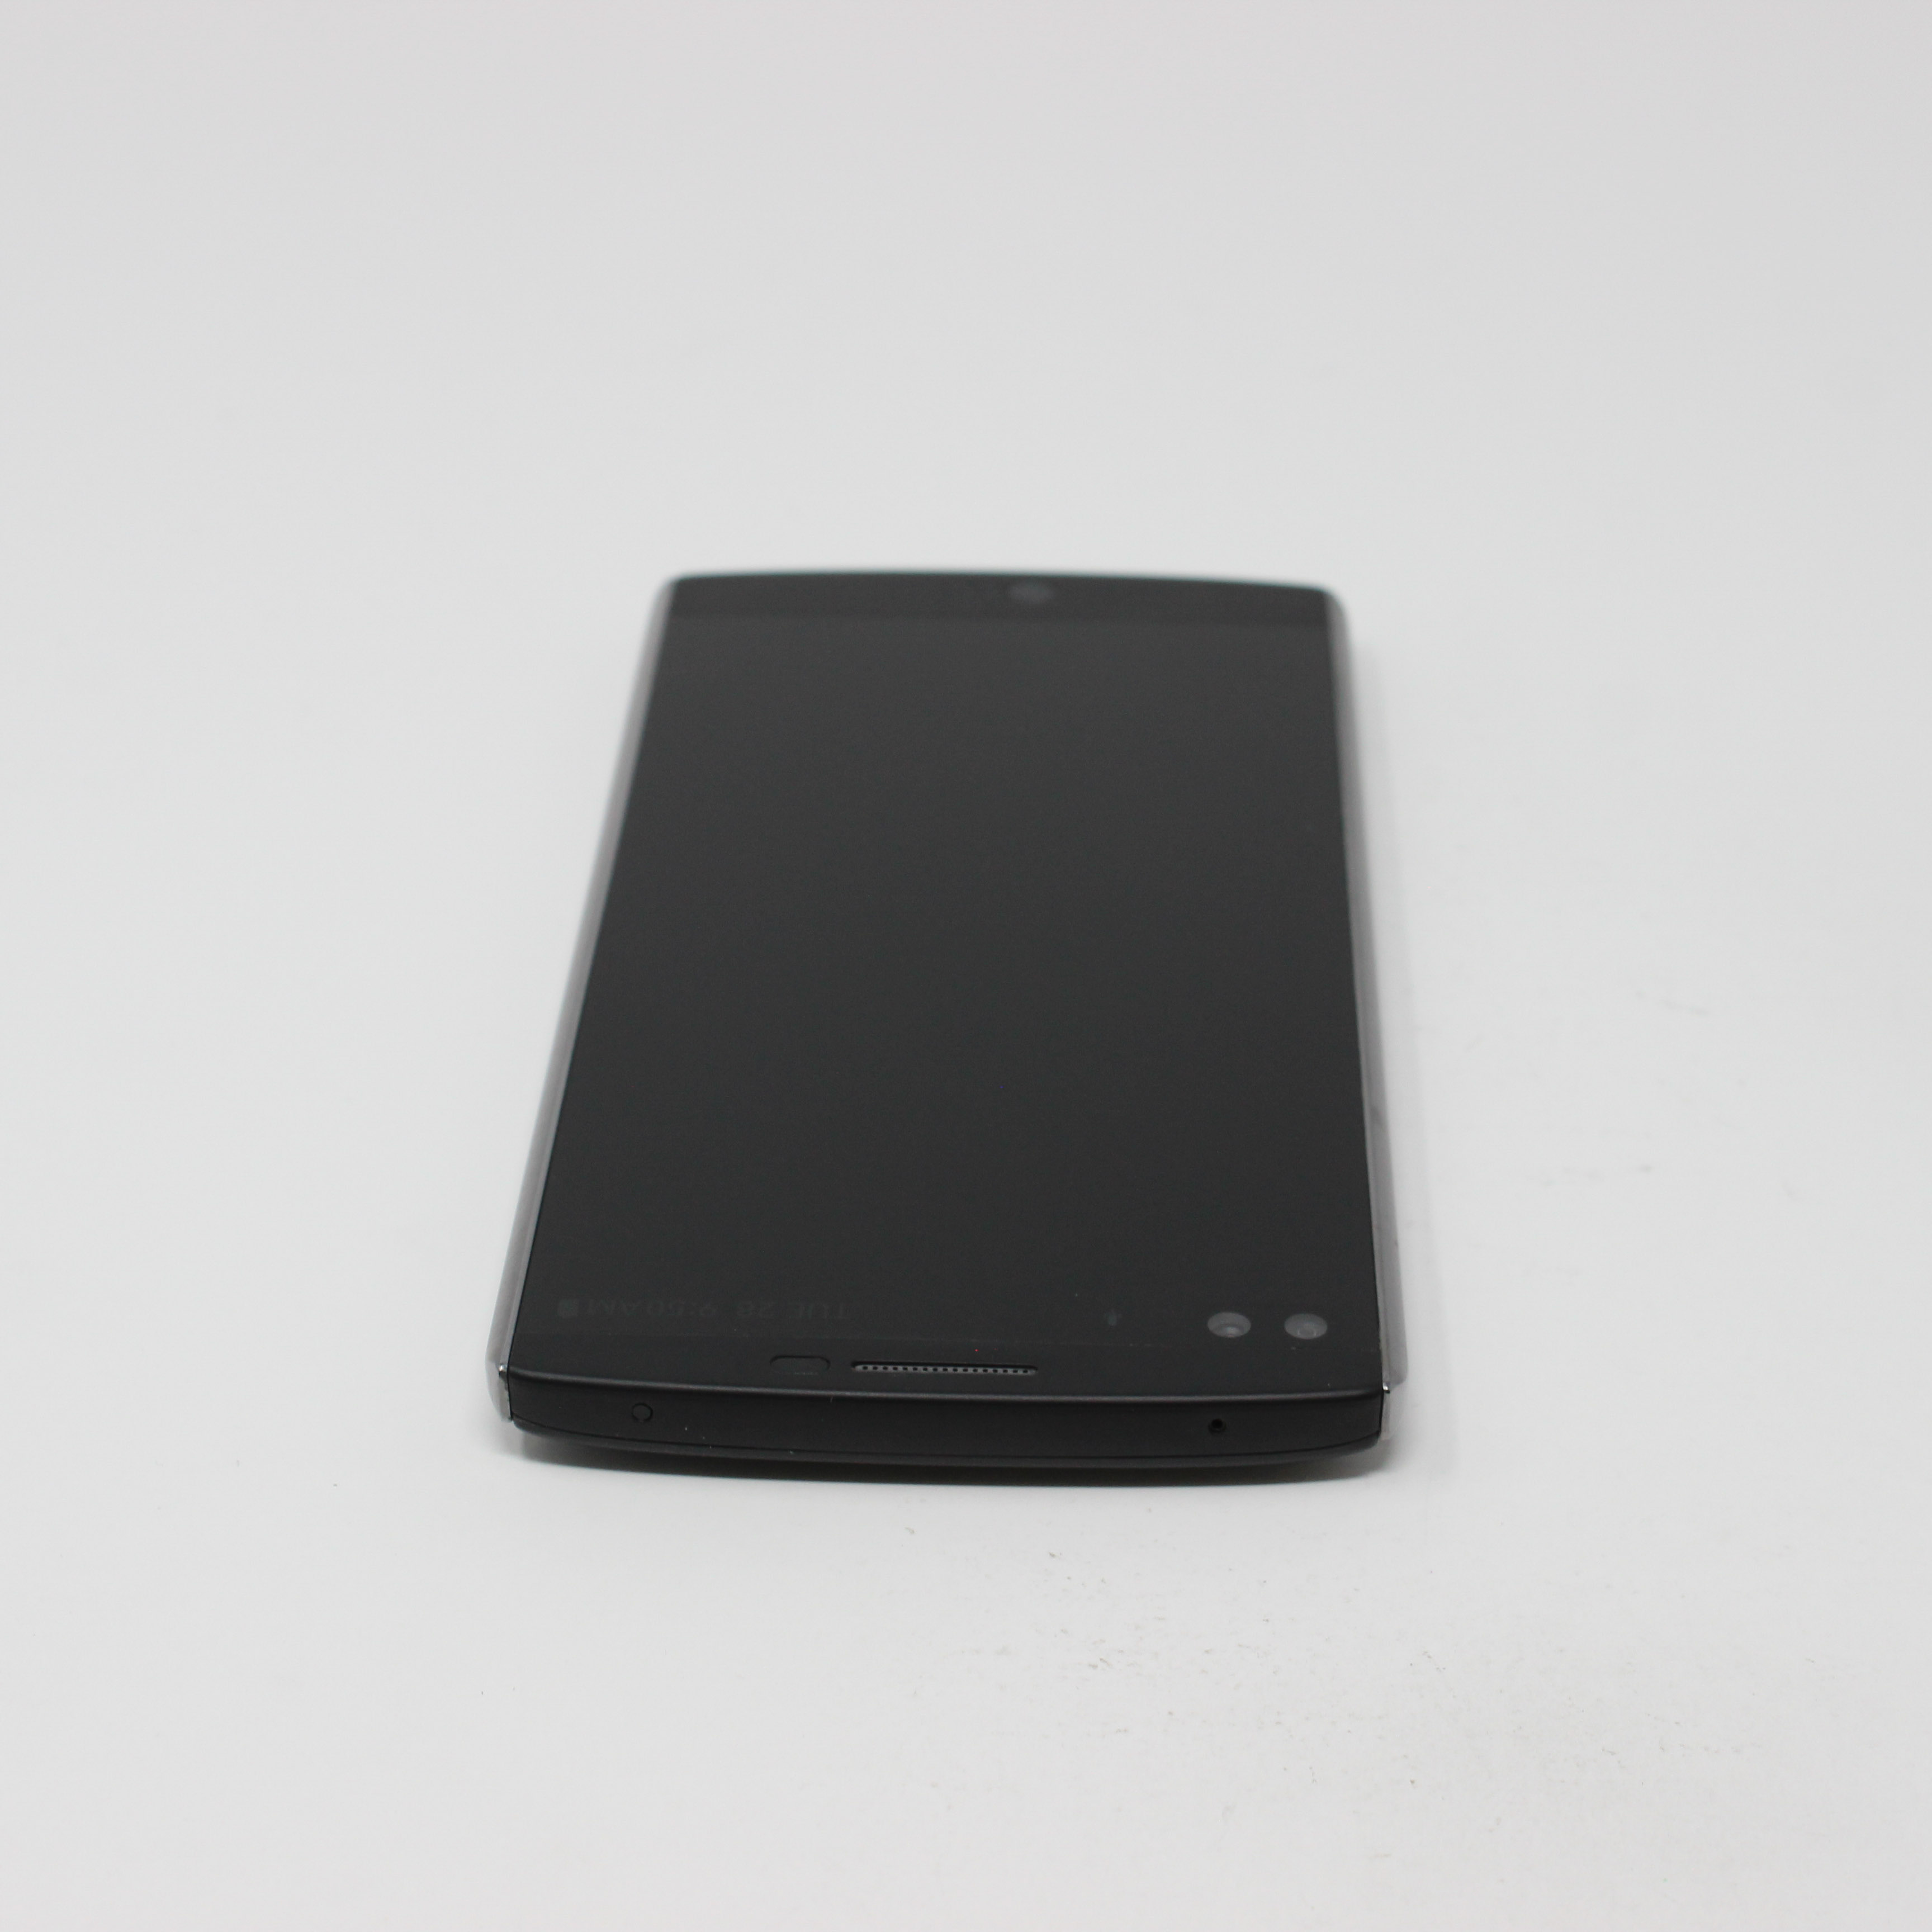 LG V10 32GB Space Black - T-Mobile photo 4 | UpTradeit.com